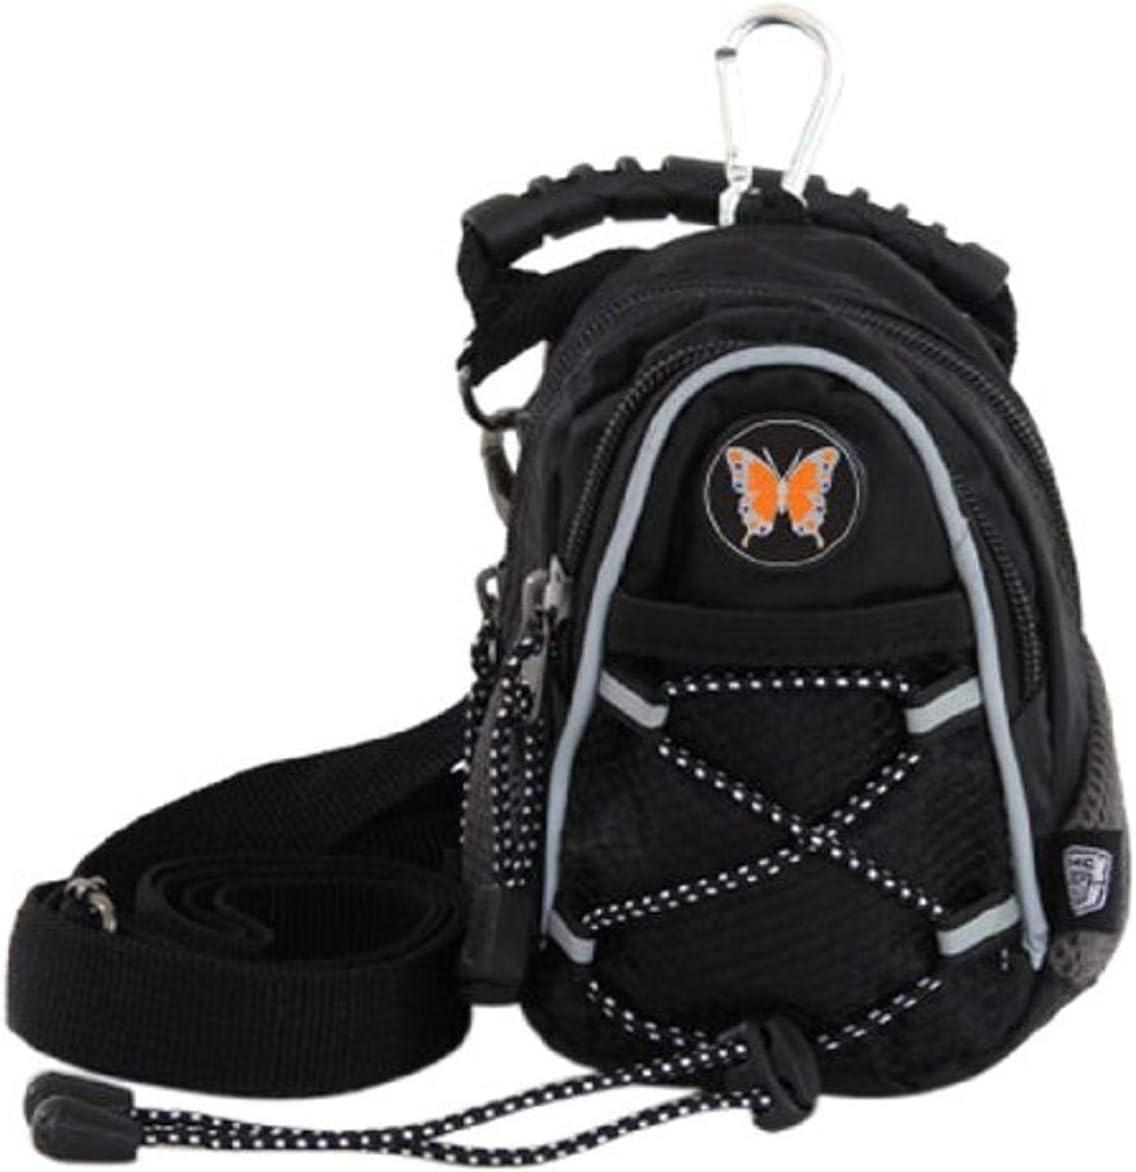 CMC Golf Butterfly Mini Daypack, Black